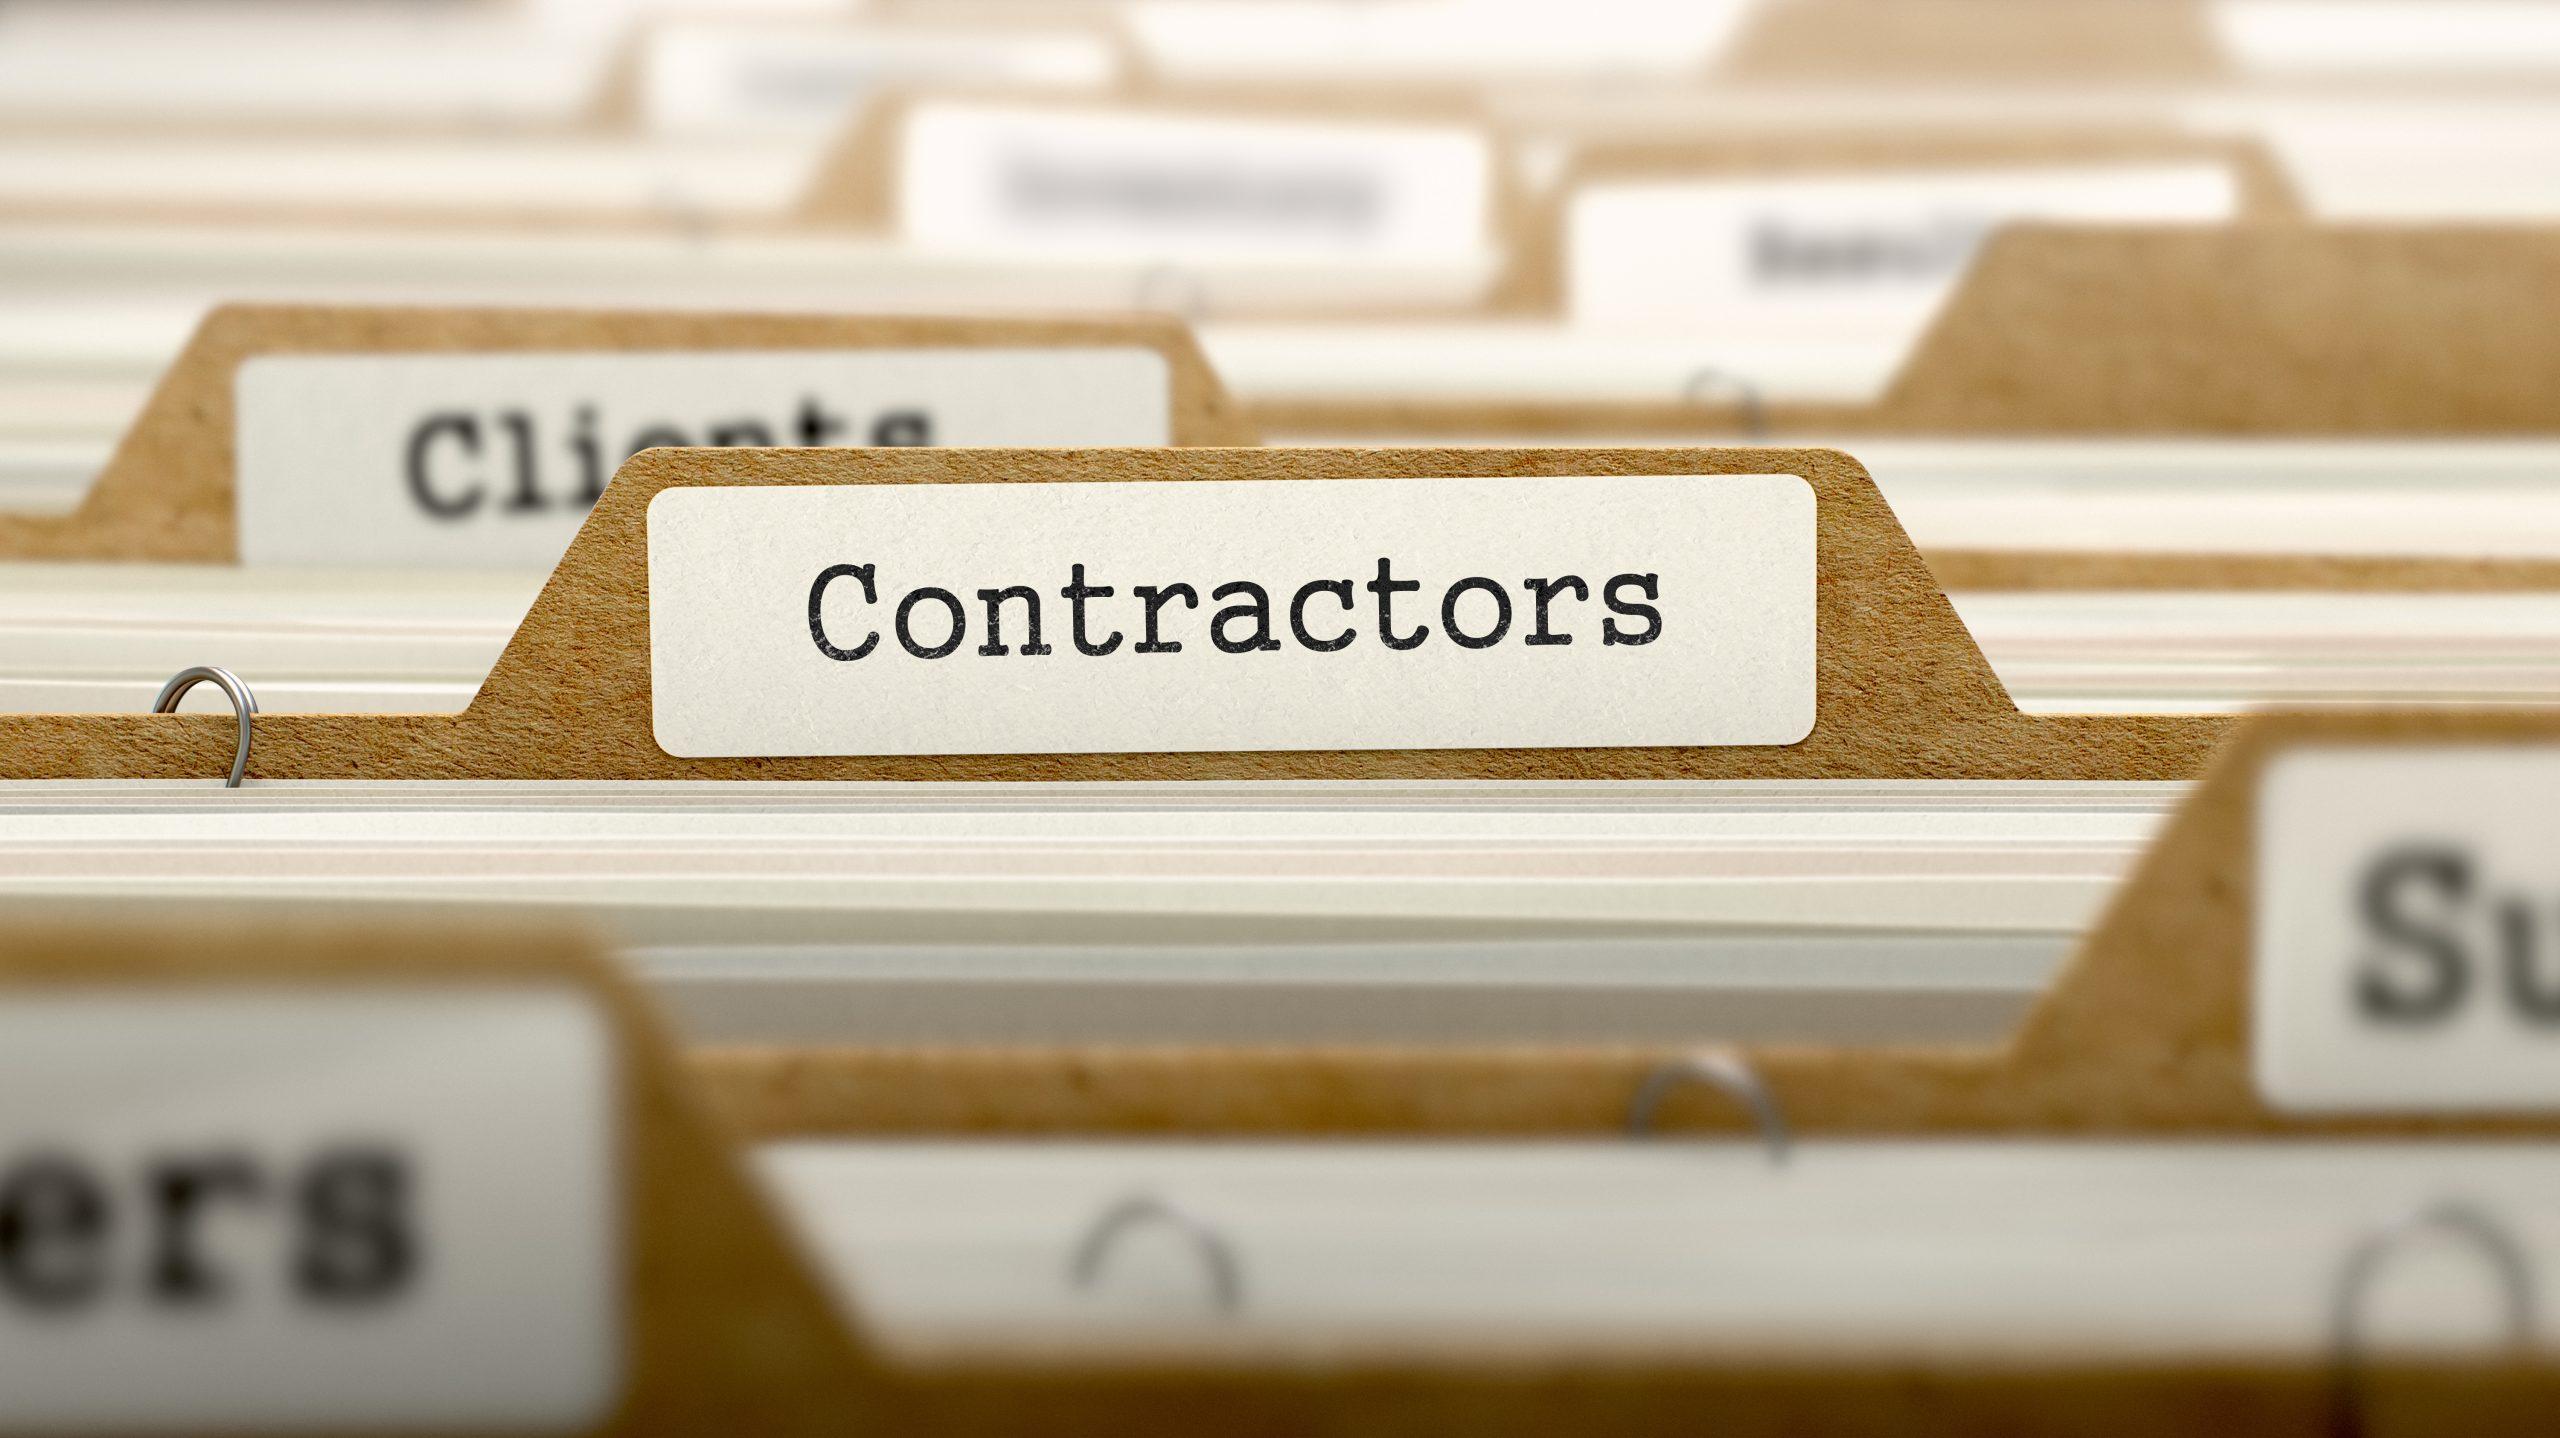 IR35 may hurt portfolio of genuine contractors and their careers in UK